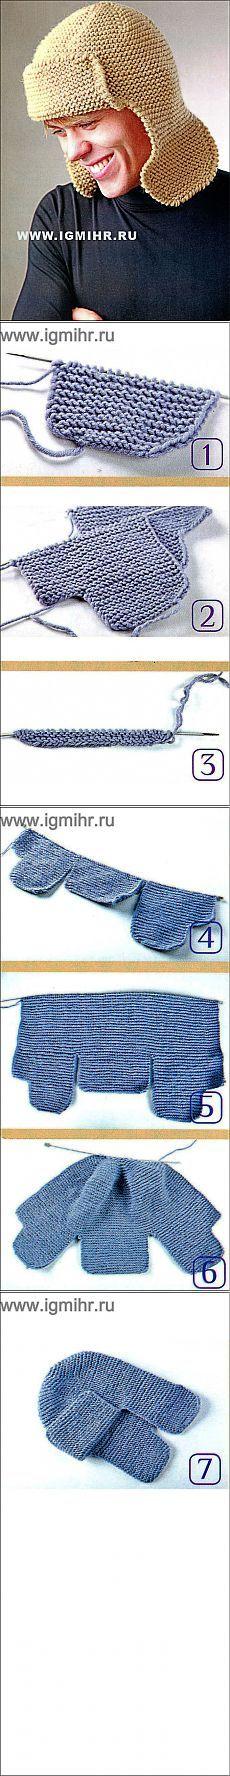 Мужская шапка-ушанка. Спицы ÕPETUS: http://igmihrru.ru/MODELI/men/035/35.html